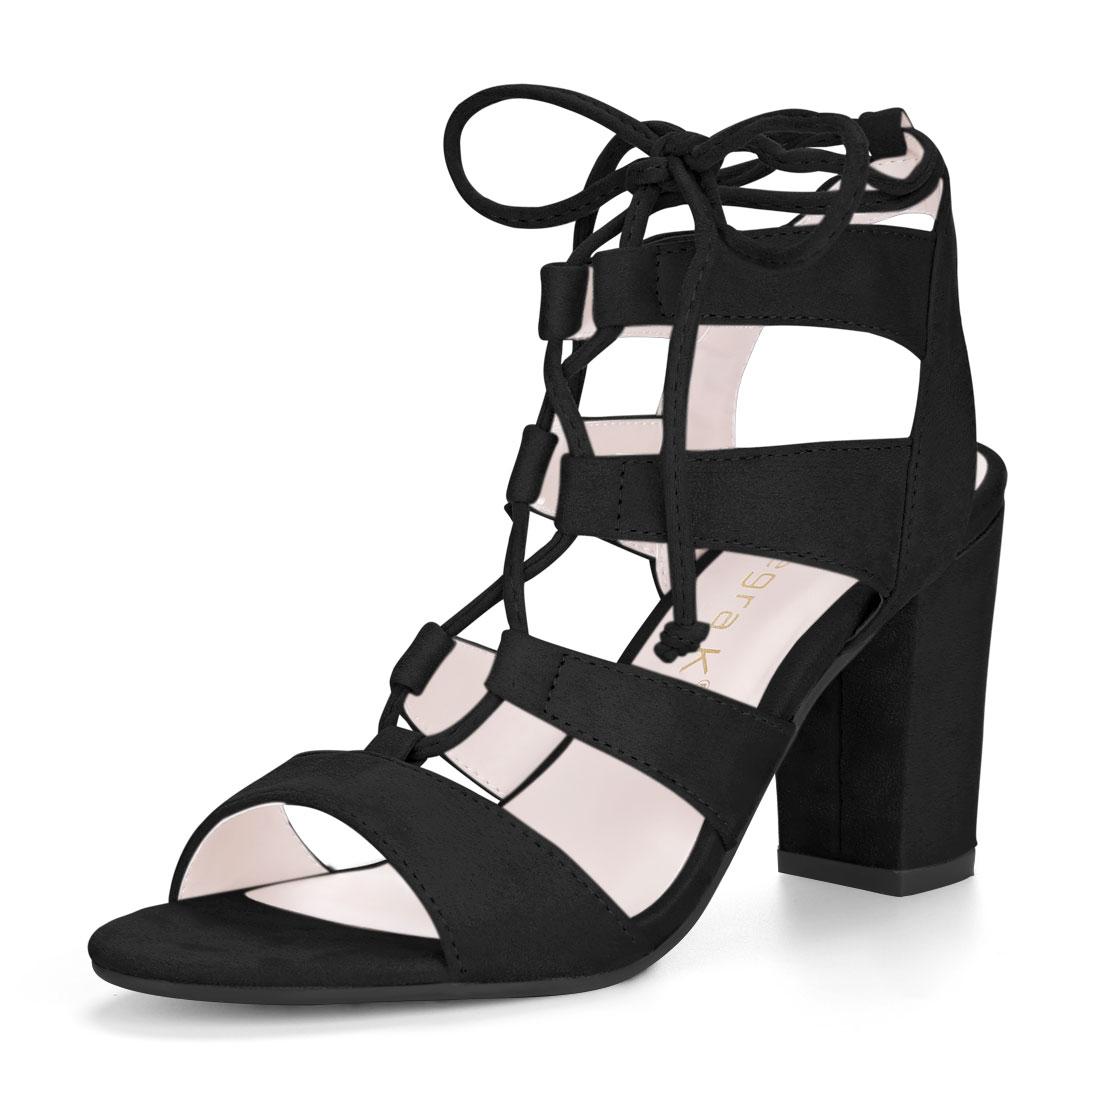 Allegra K Women's Tie Up Strappy Gladiator Block Heel Sandals Black US 6